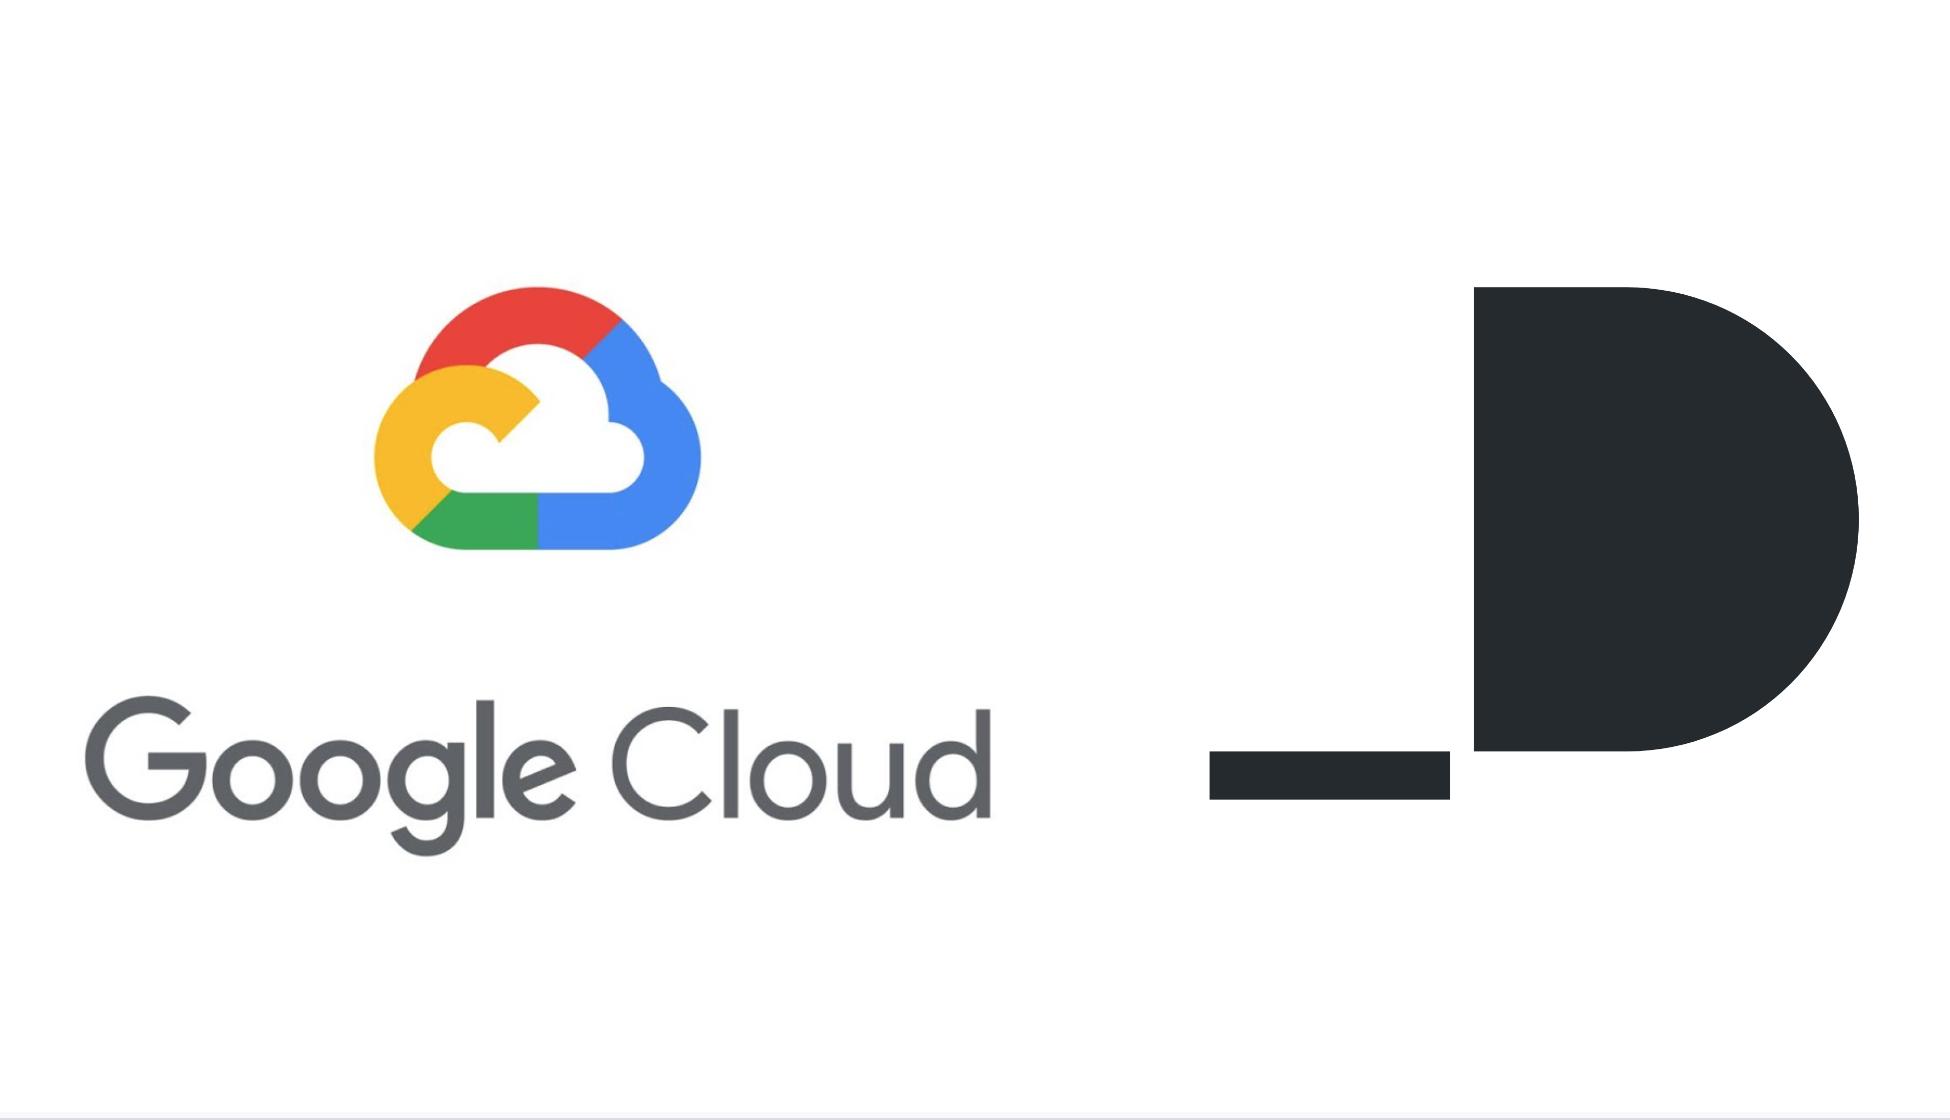 Sponsored by Google Cloud